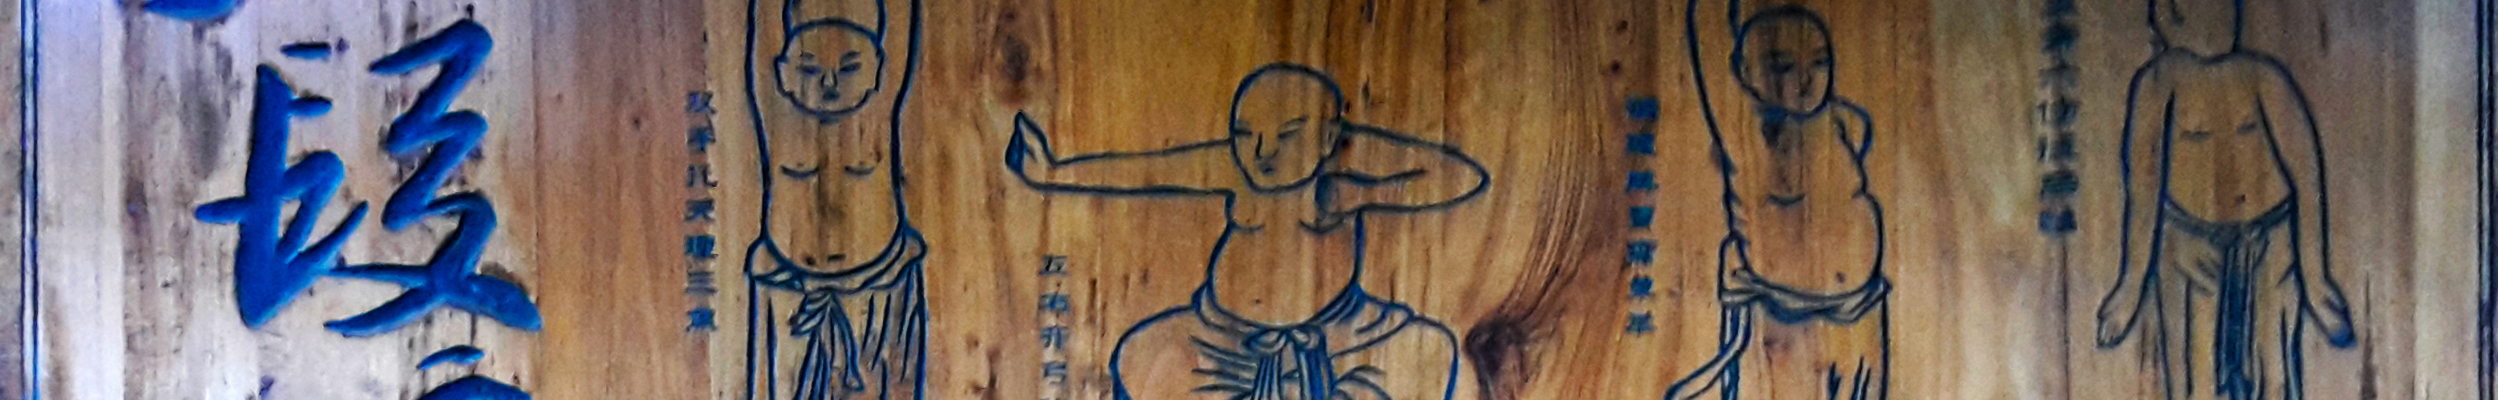 Qigong Anke Riedel